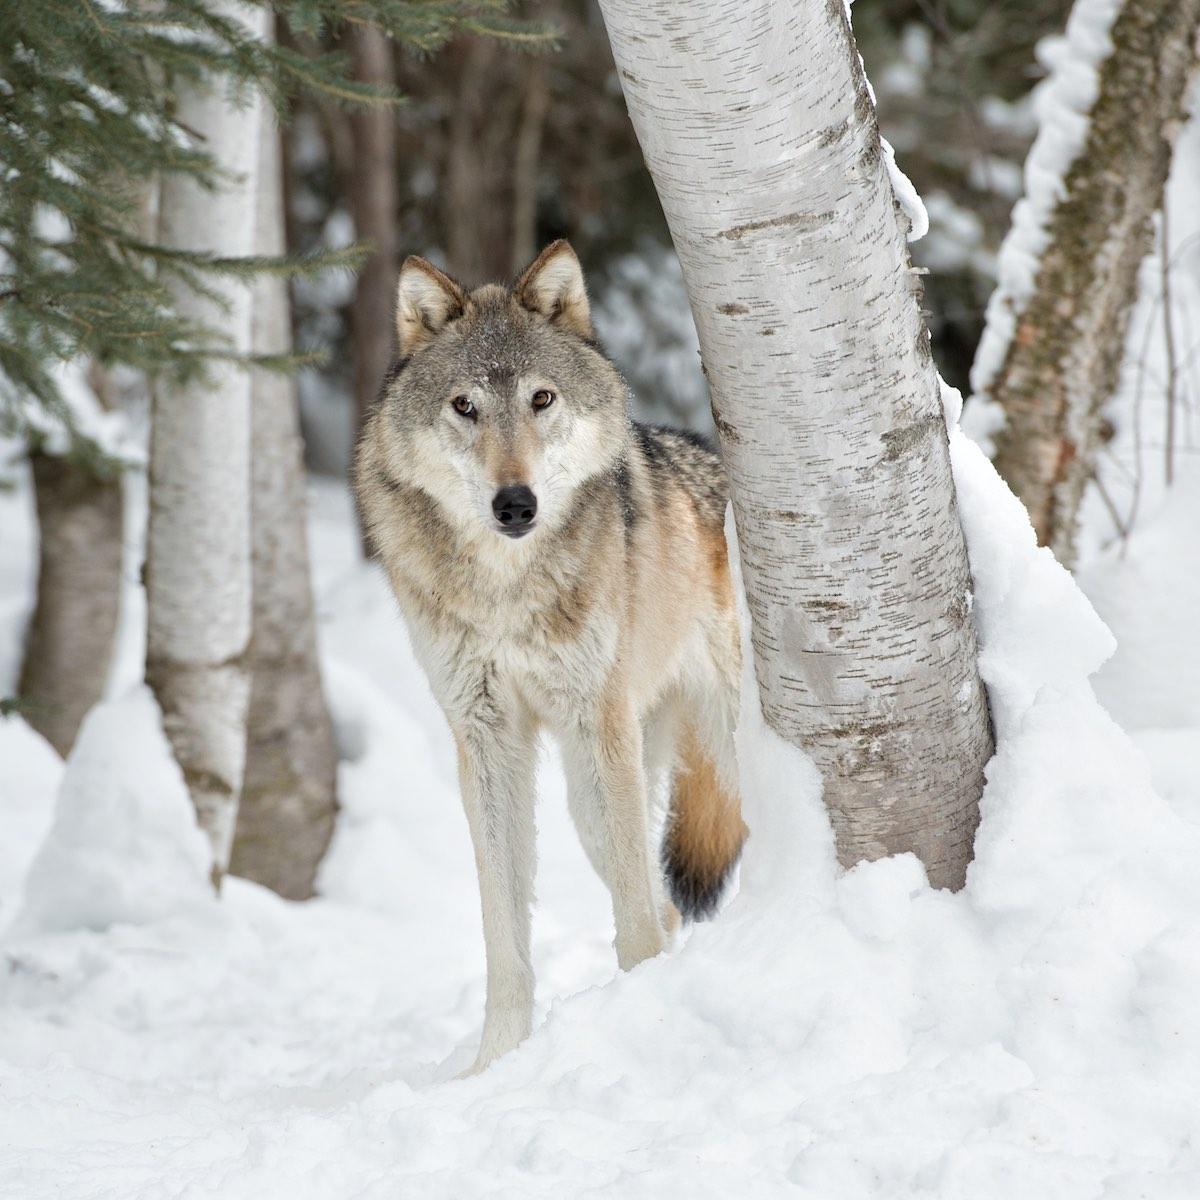 wildlife in winter snow photography workshop with kathleen reeder